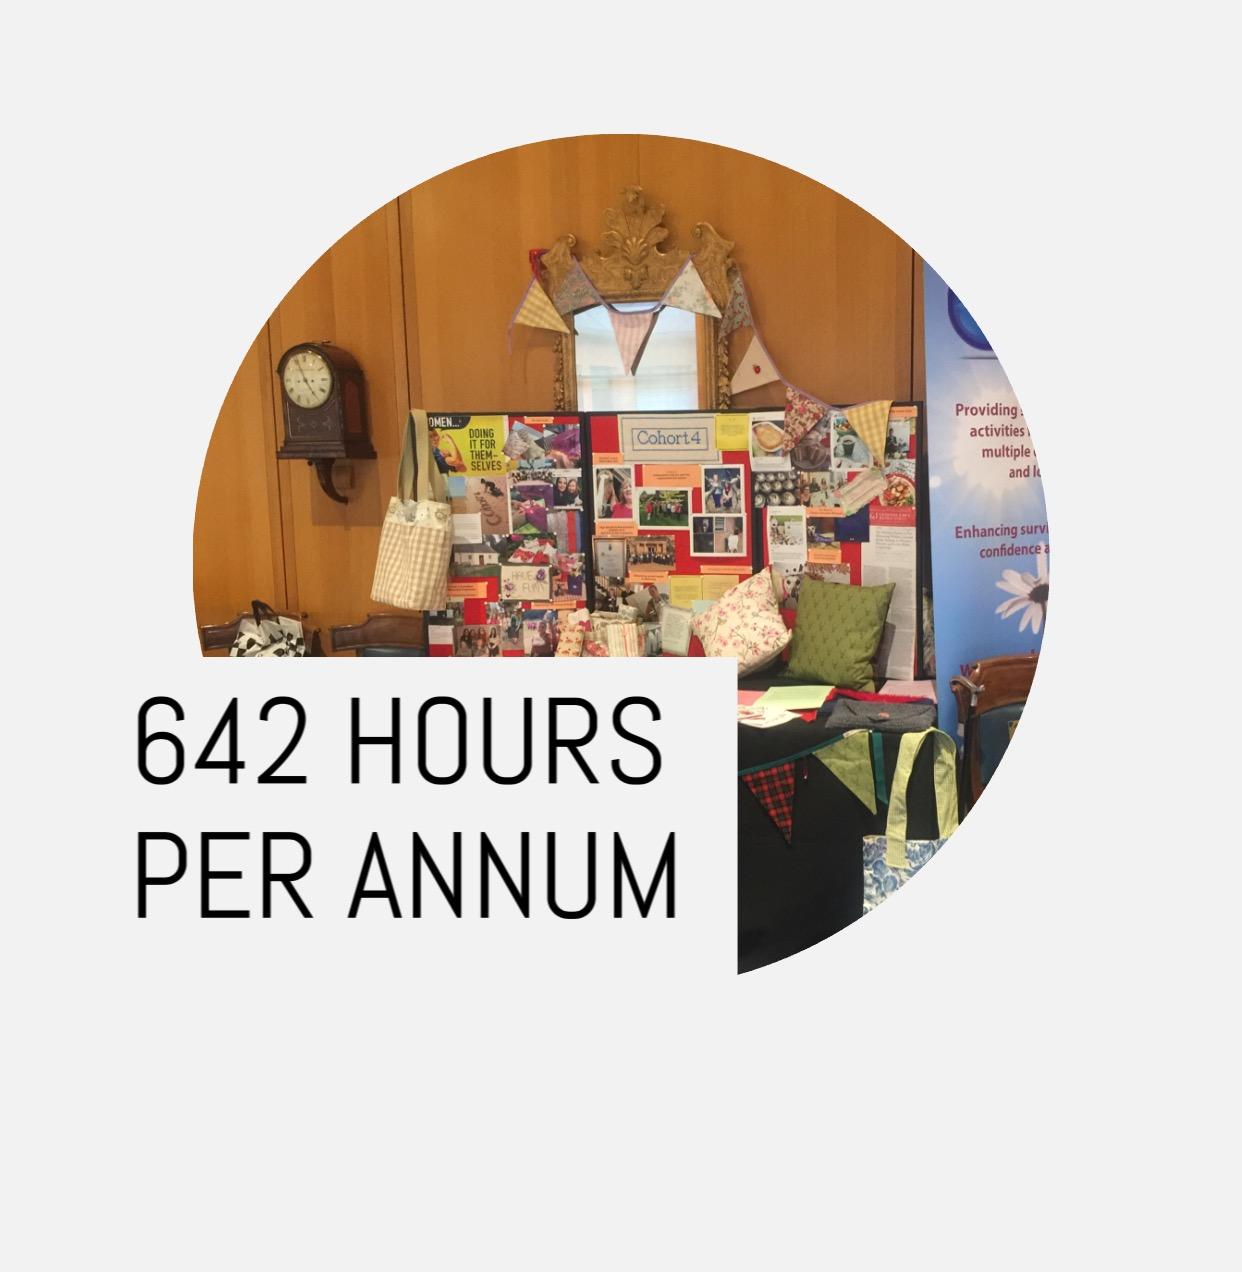 642 Volunteer hours keep Cohort 4 alive 2017/18